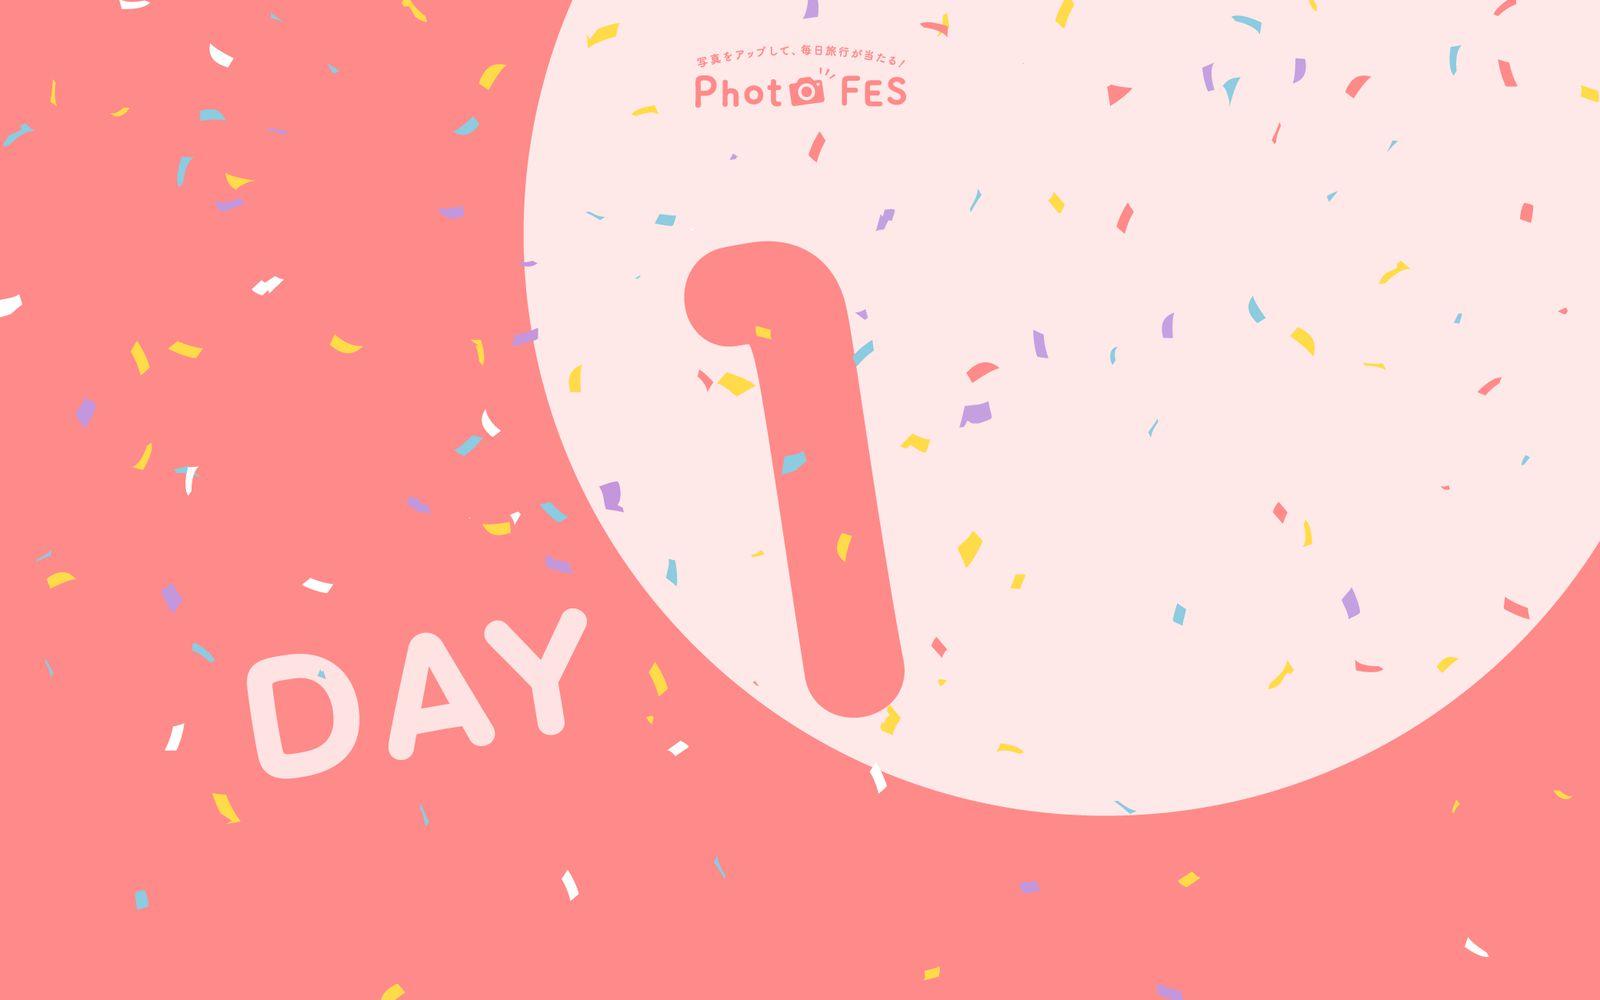 【DAY1】「Photo FES Summer シーズン2」8月17日投稿分であたる賞品&受賞者発表